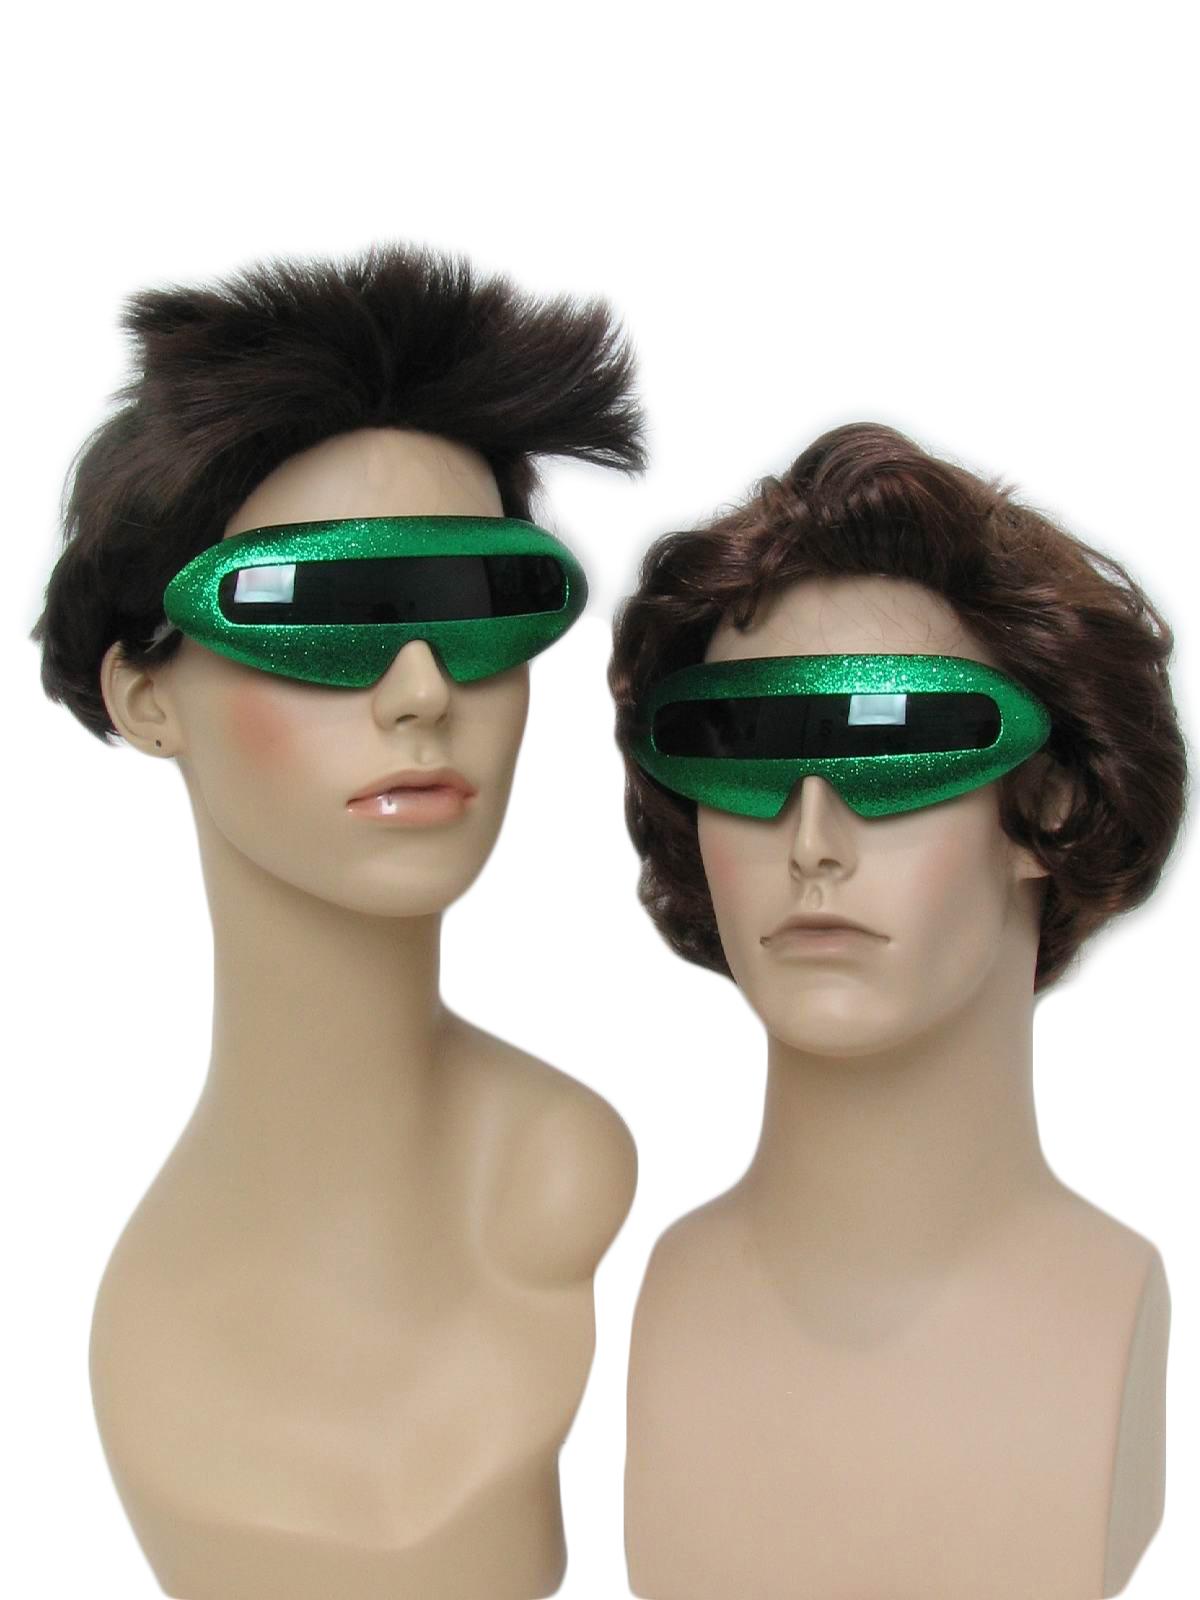 Green Look 1980's Unisex Stars Devo 80s Christmas Punk Totally Party Sunglasses Style Glittery Vintage zVSUpGLqM